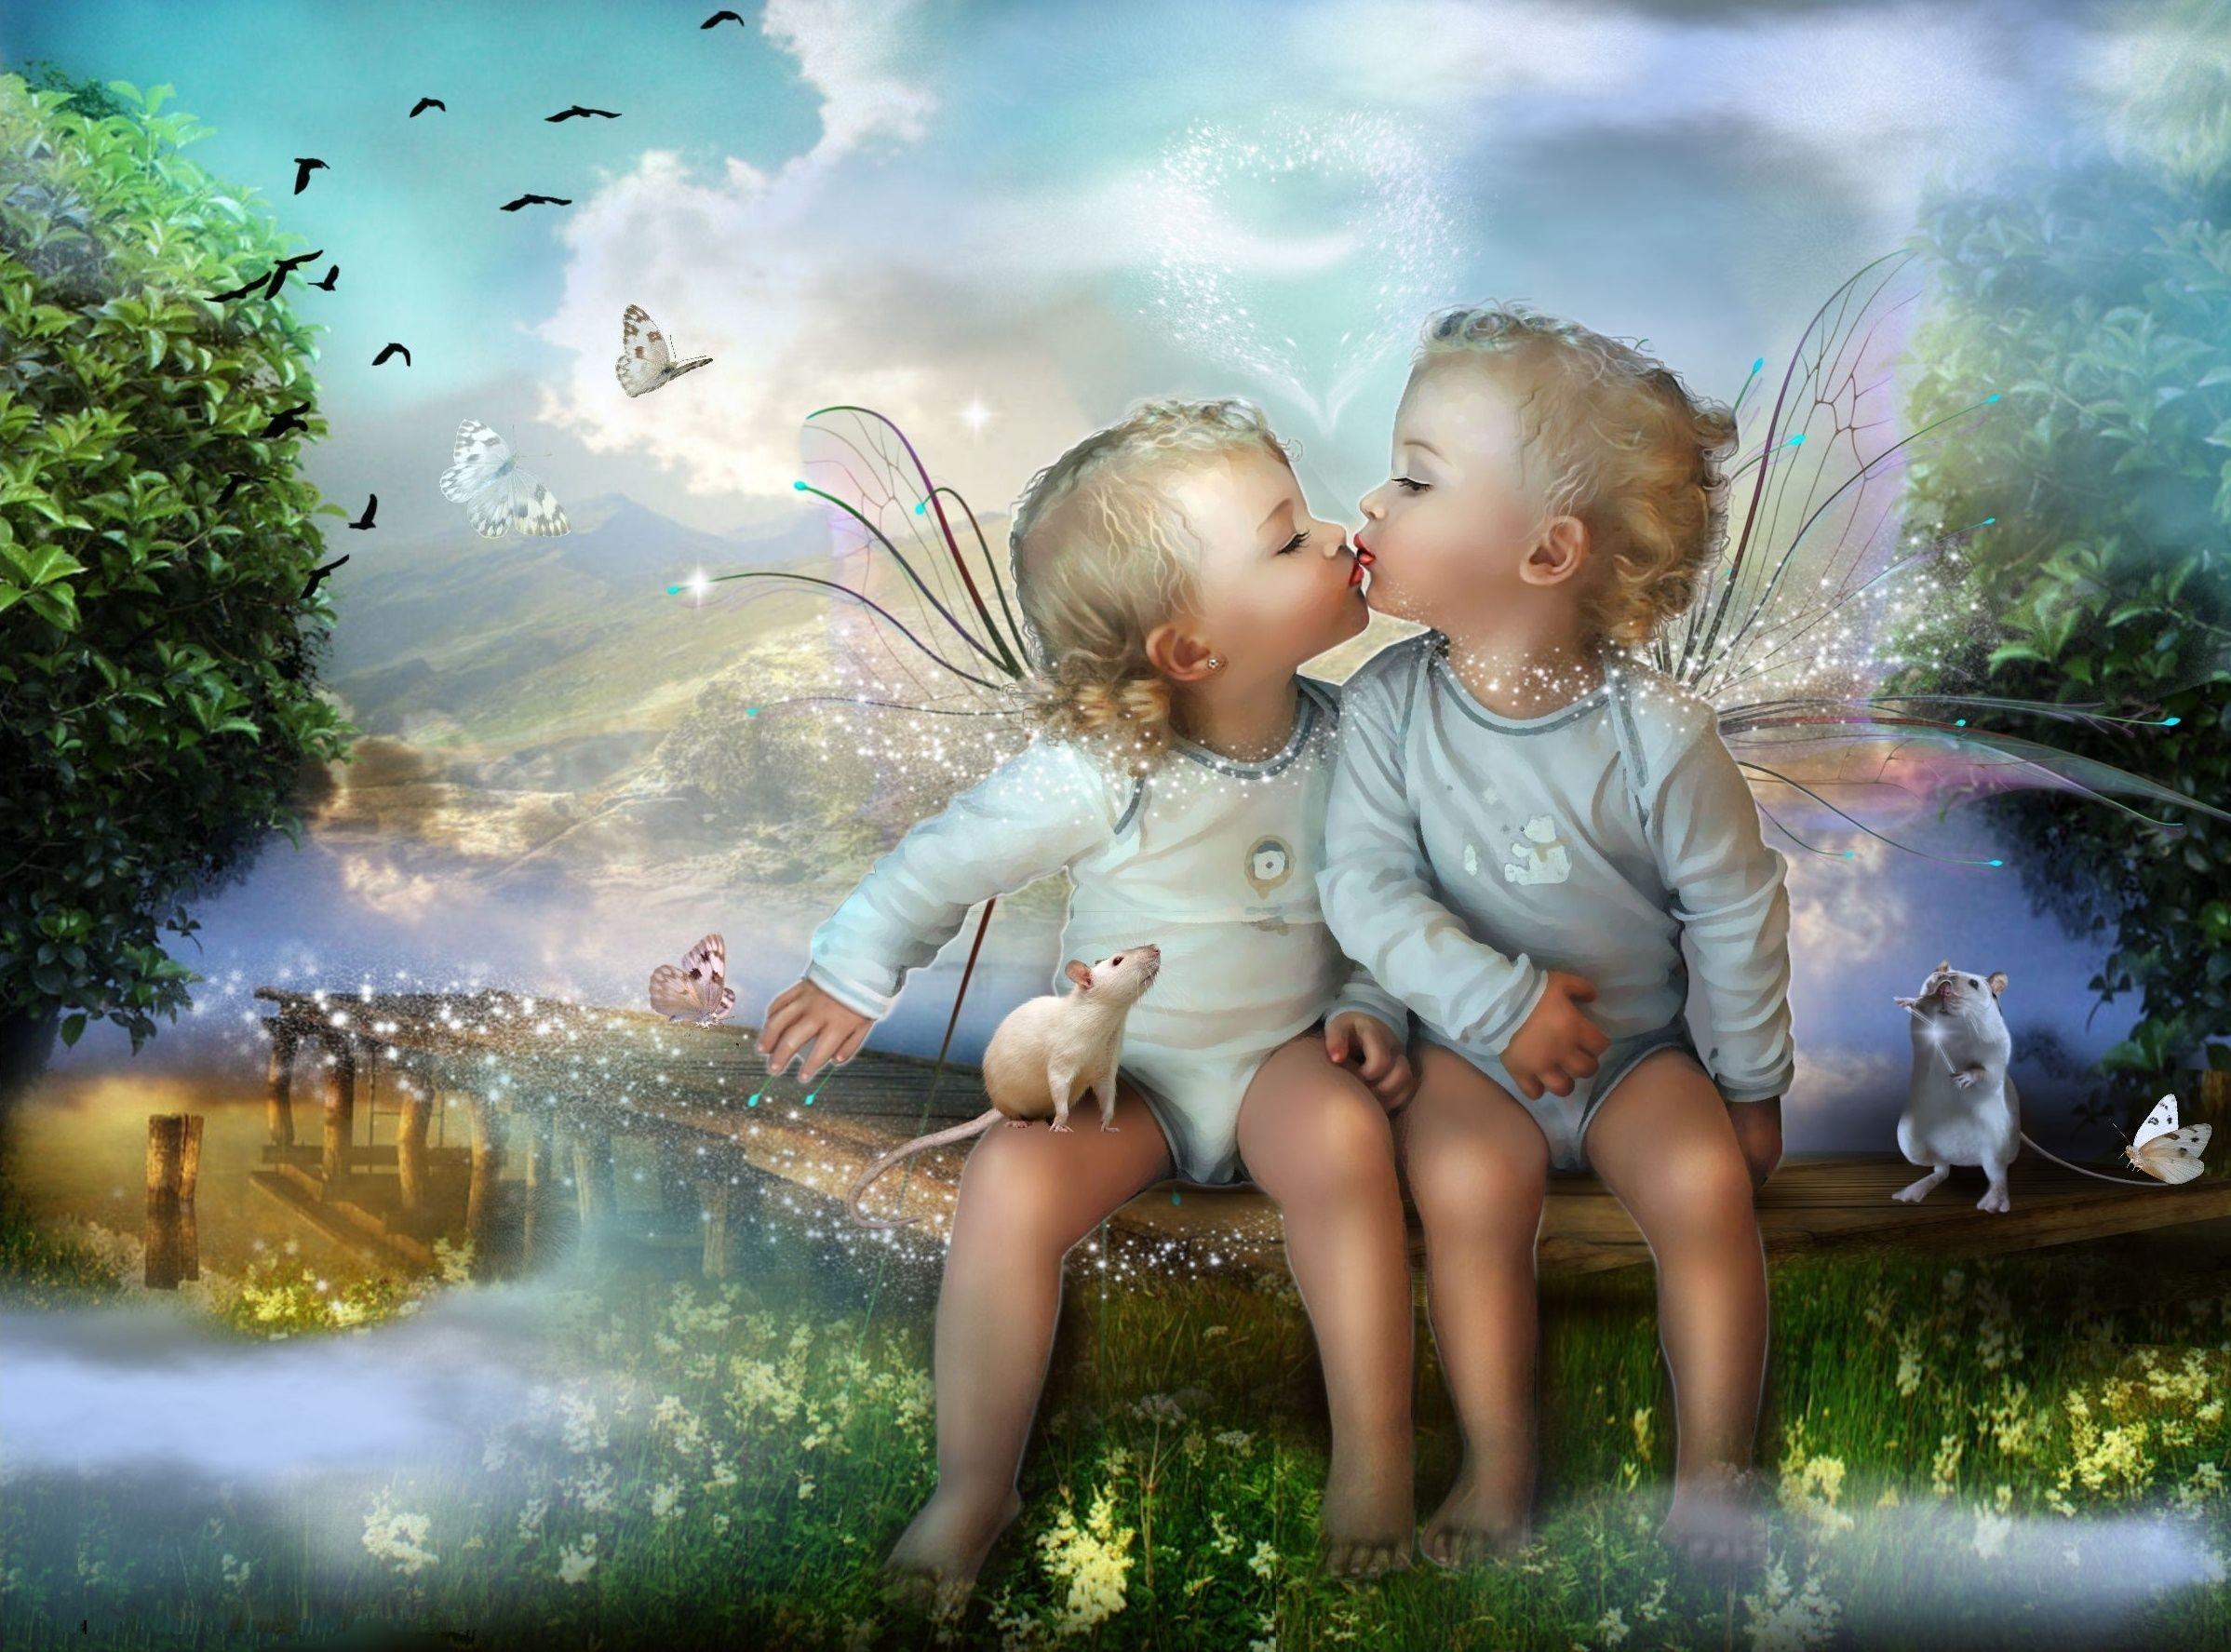 Res: 2397x1775, Cute Fairy Baby